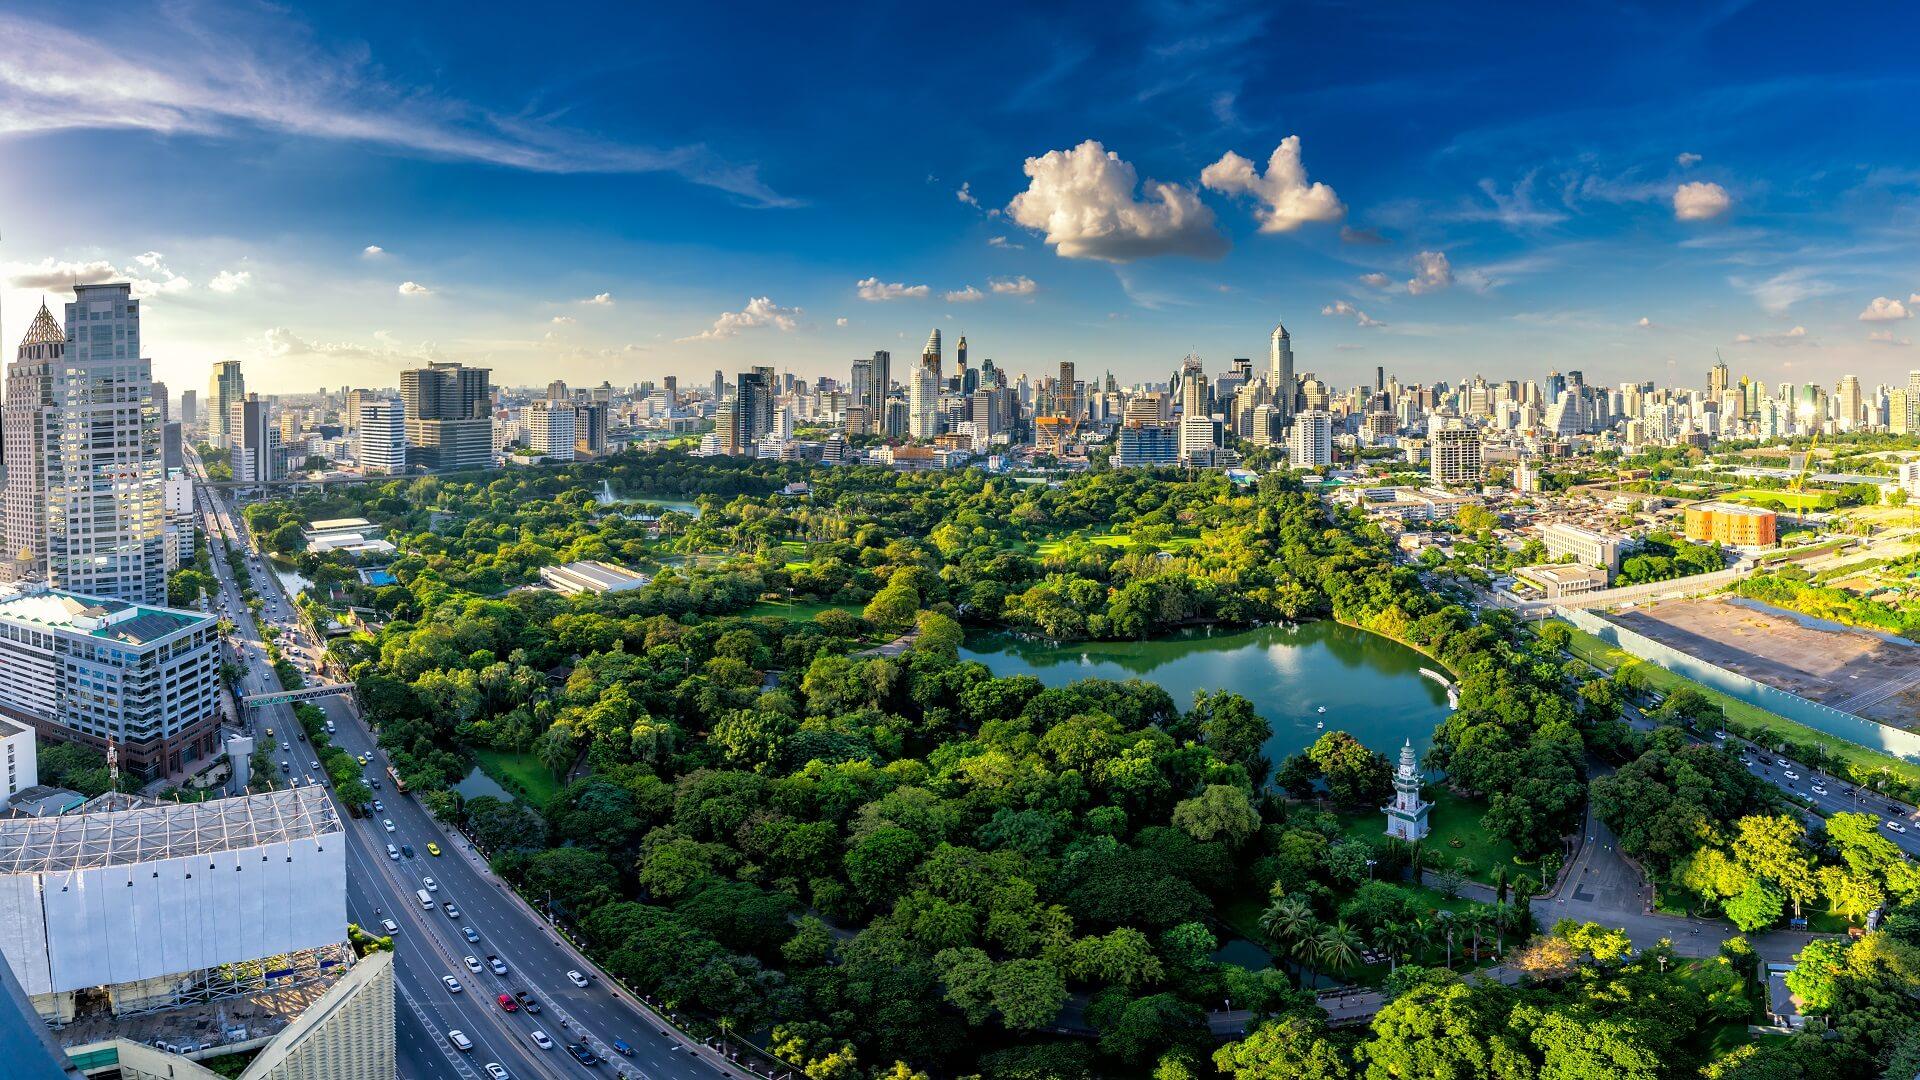 Im Lumpini Park in Bangkok kann man sich super entspannen